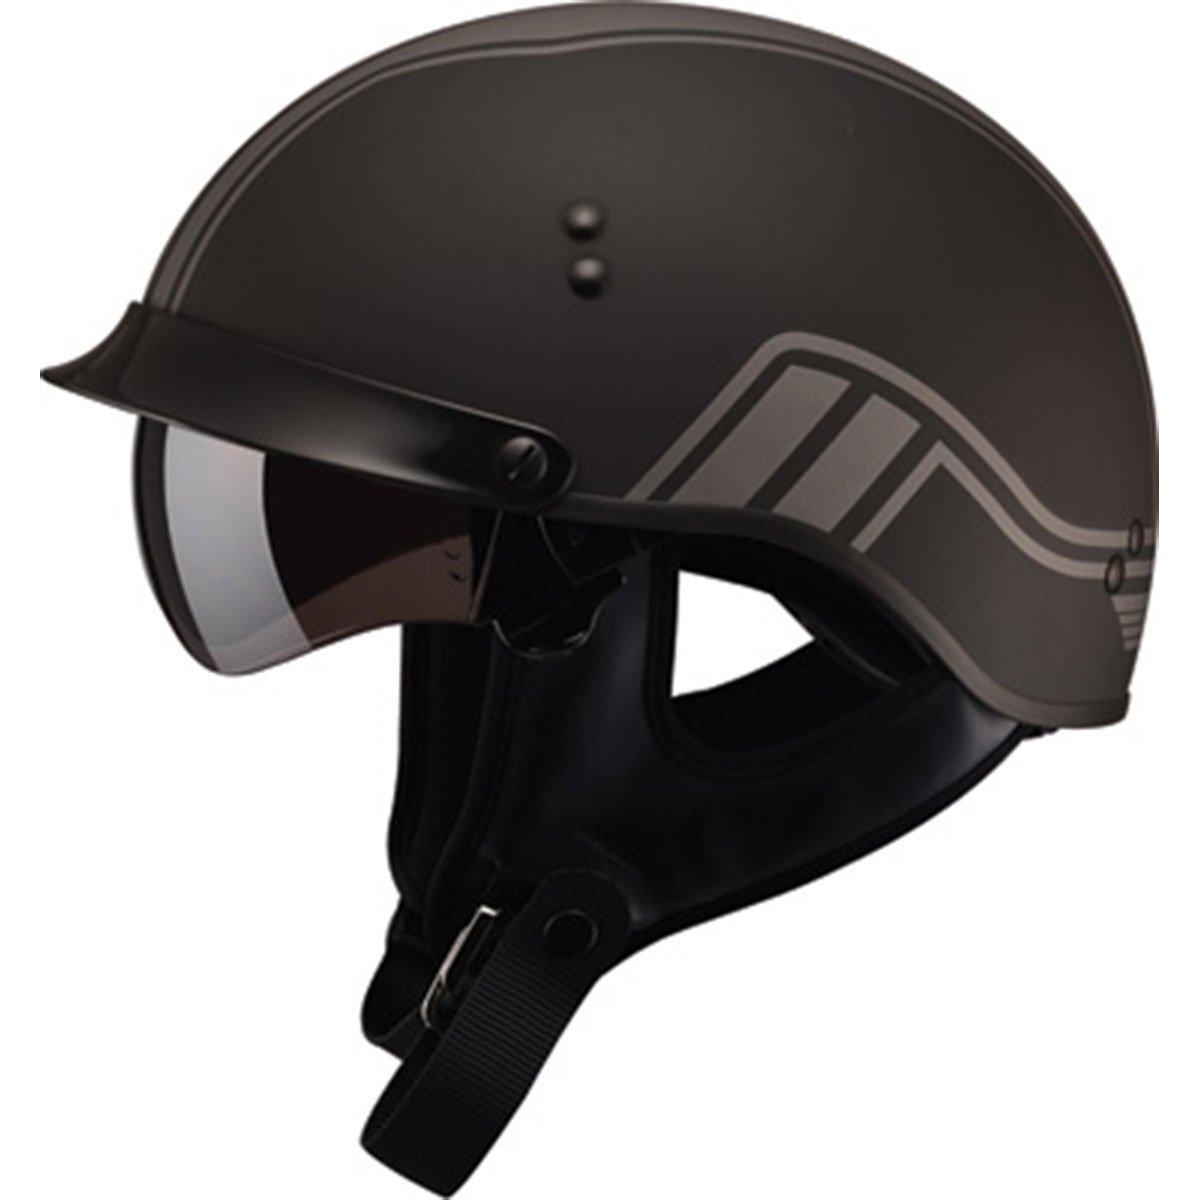 GMAX unisex-adult full-face-helmet-style Helmet (Gm65 Full Dressed Half Twin) (Flat Black/Silver, Medium)